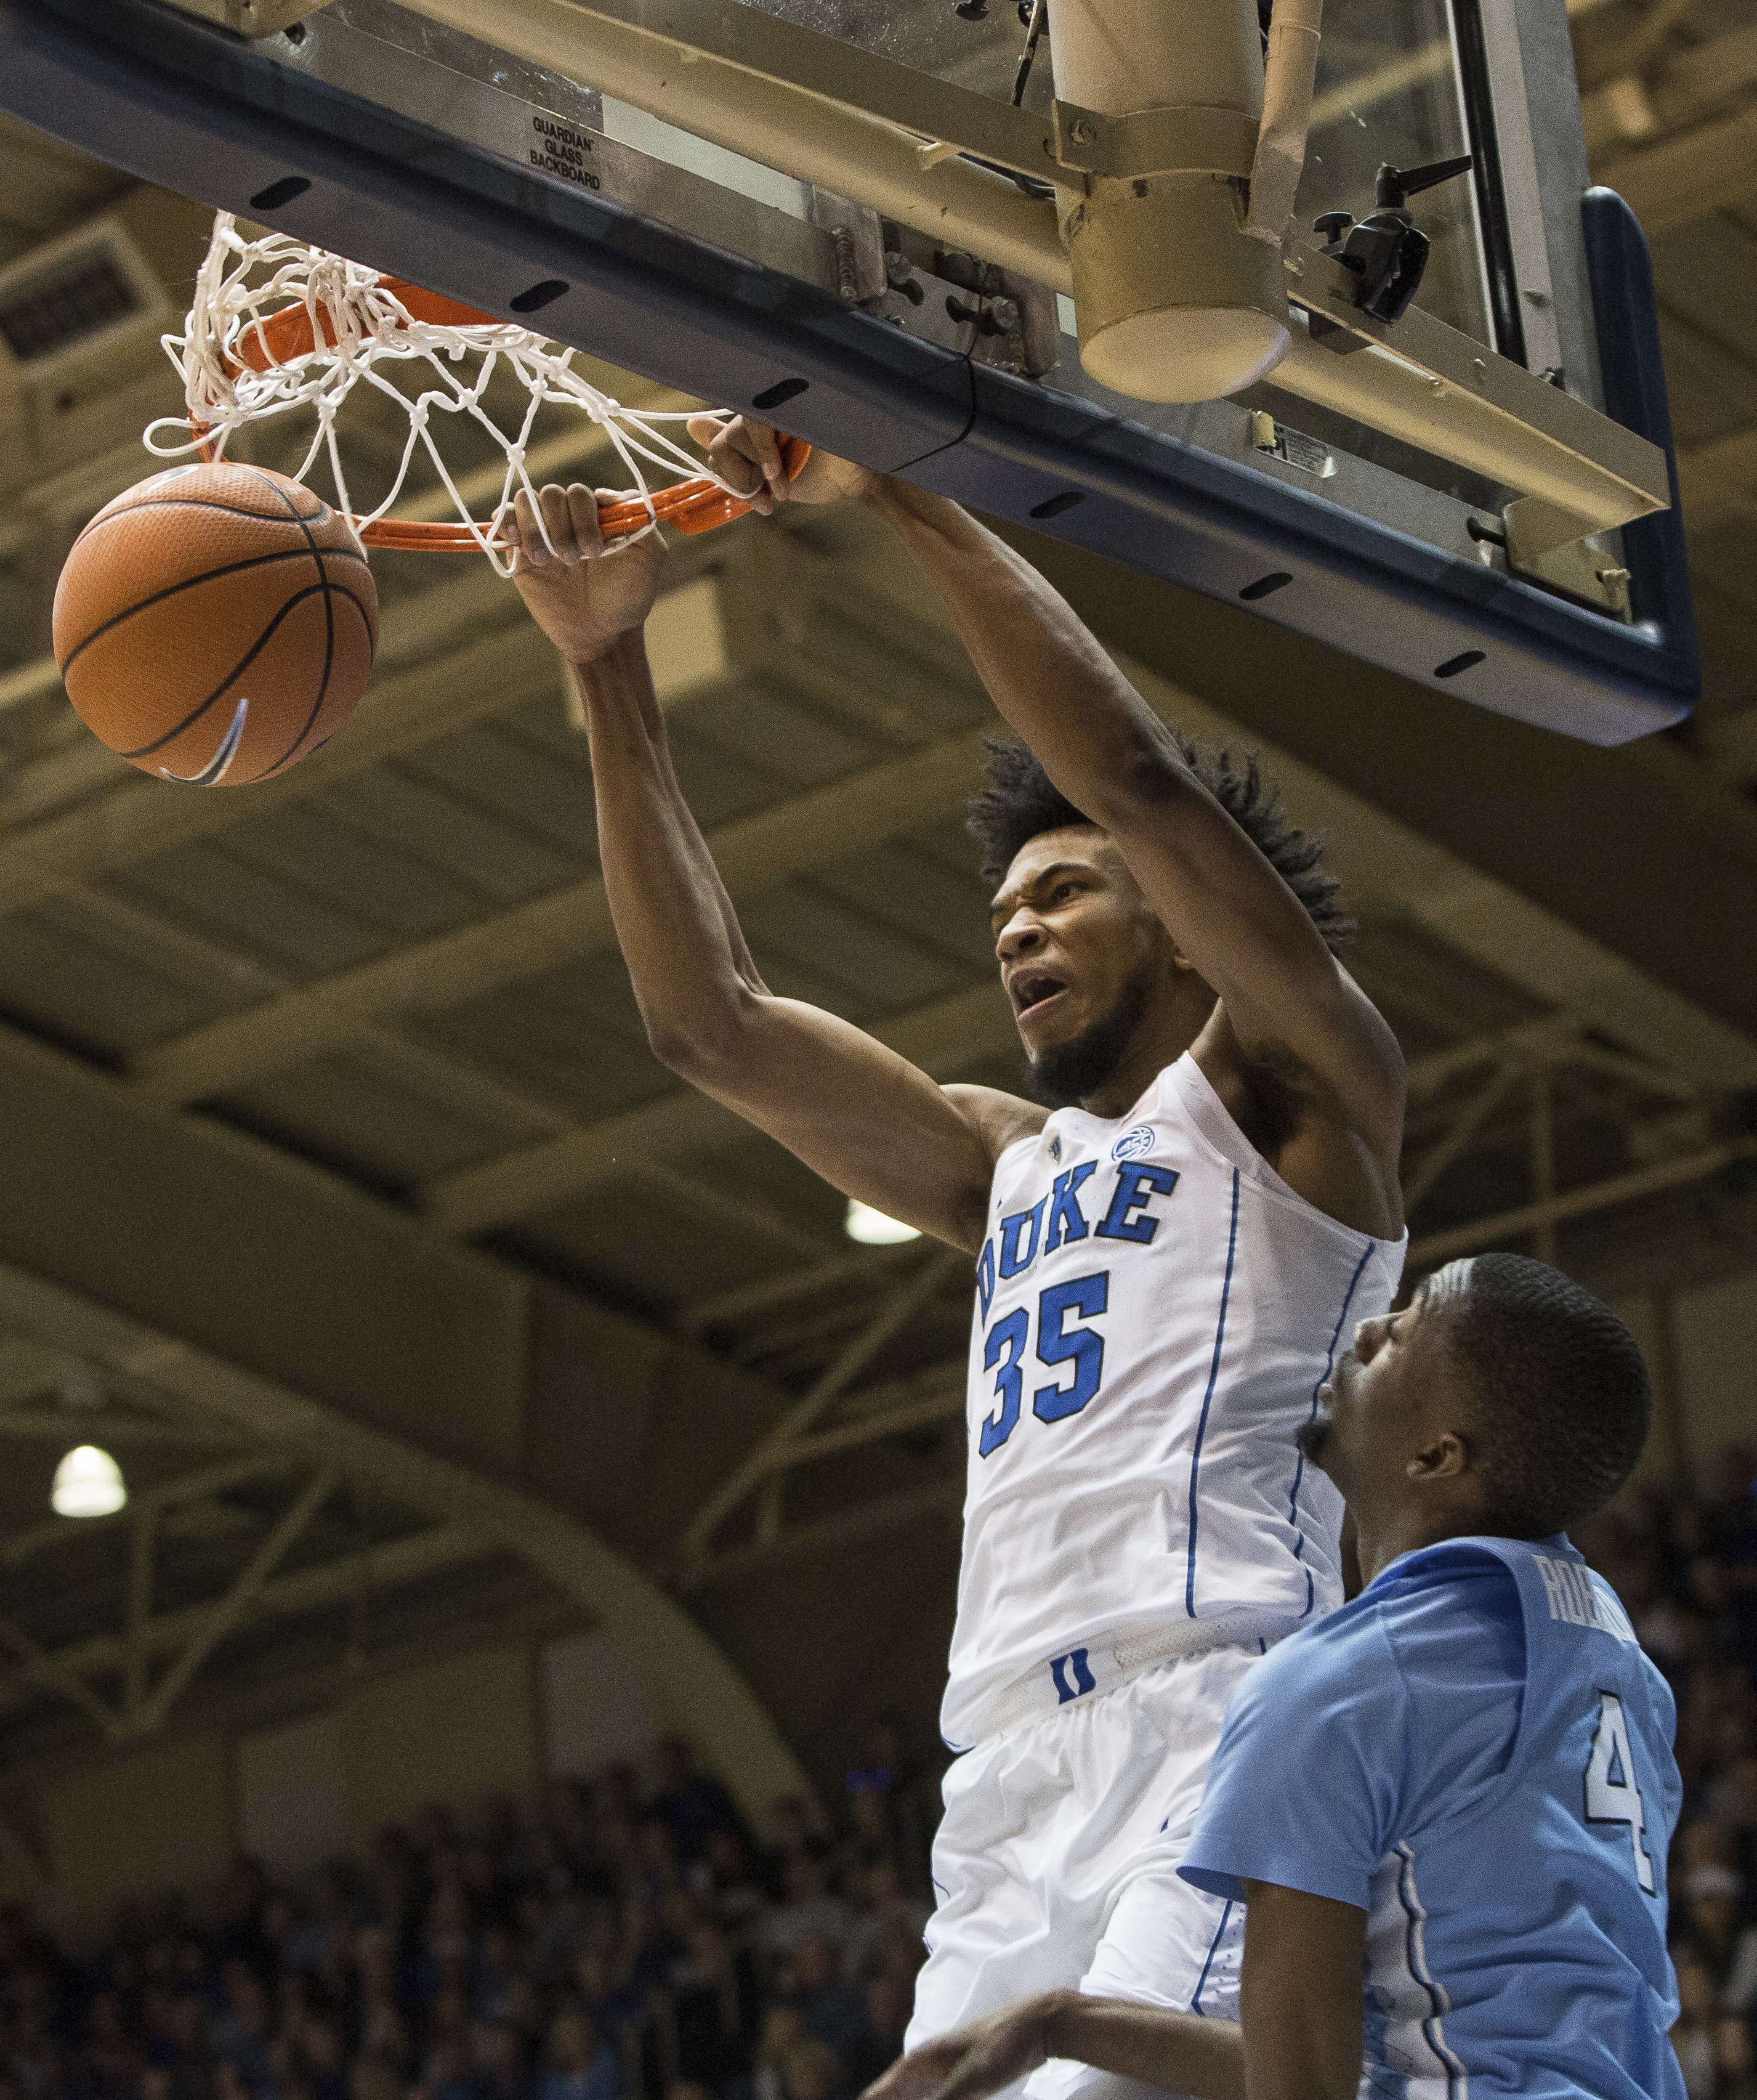 <div class='meta'><div class='origin-logo' data-origin='none'></div><span class='caption-text' data-credit='AP Photo/Ben McKeown'>Duke's Marvin Bagley III (35) dunks over North Carolina's Brandon Robinson (4) during the first half of an NCAA college basketball game</span></div>